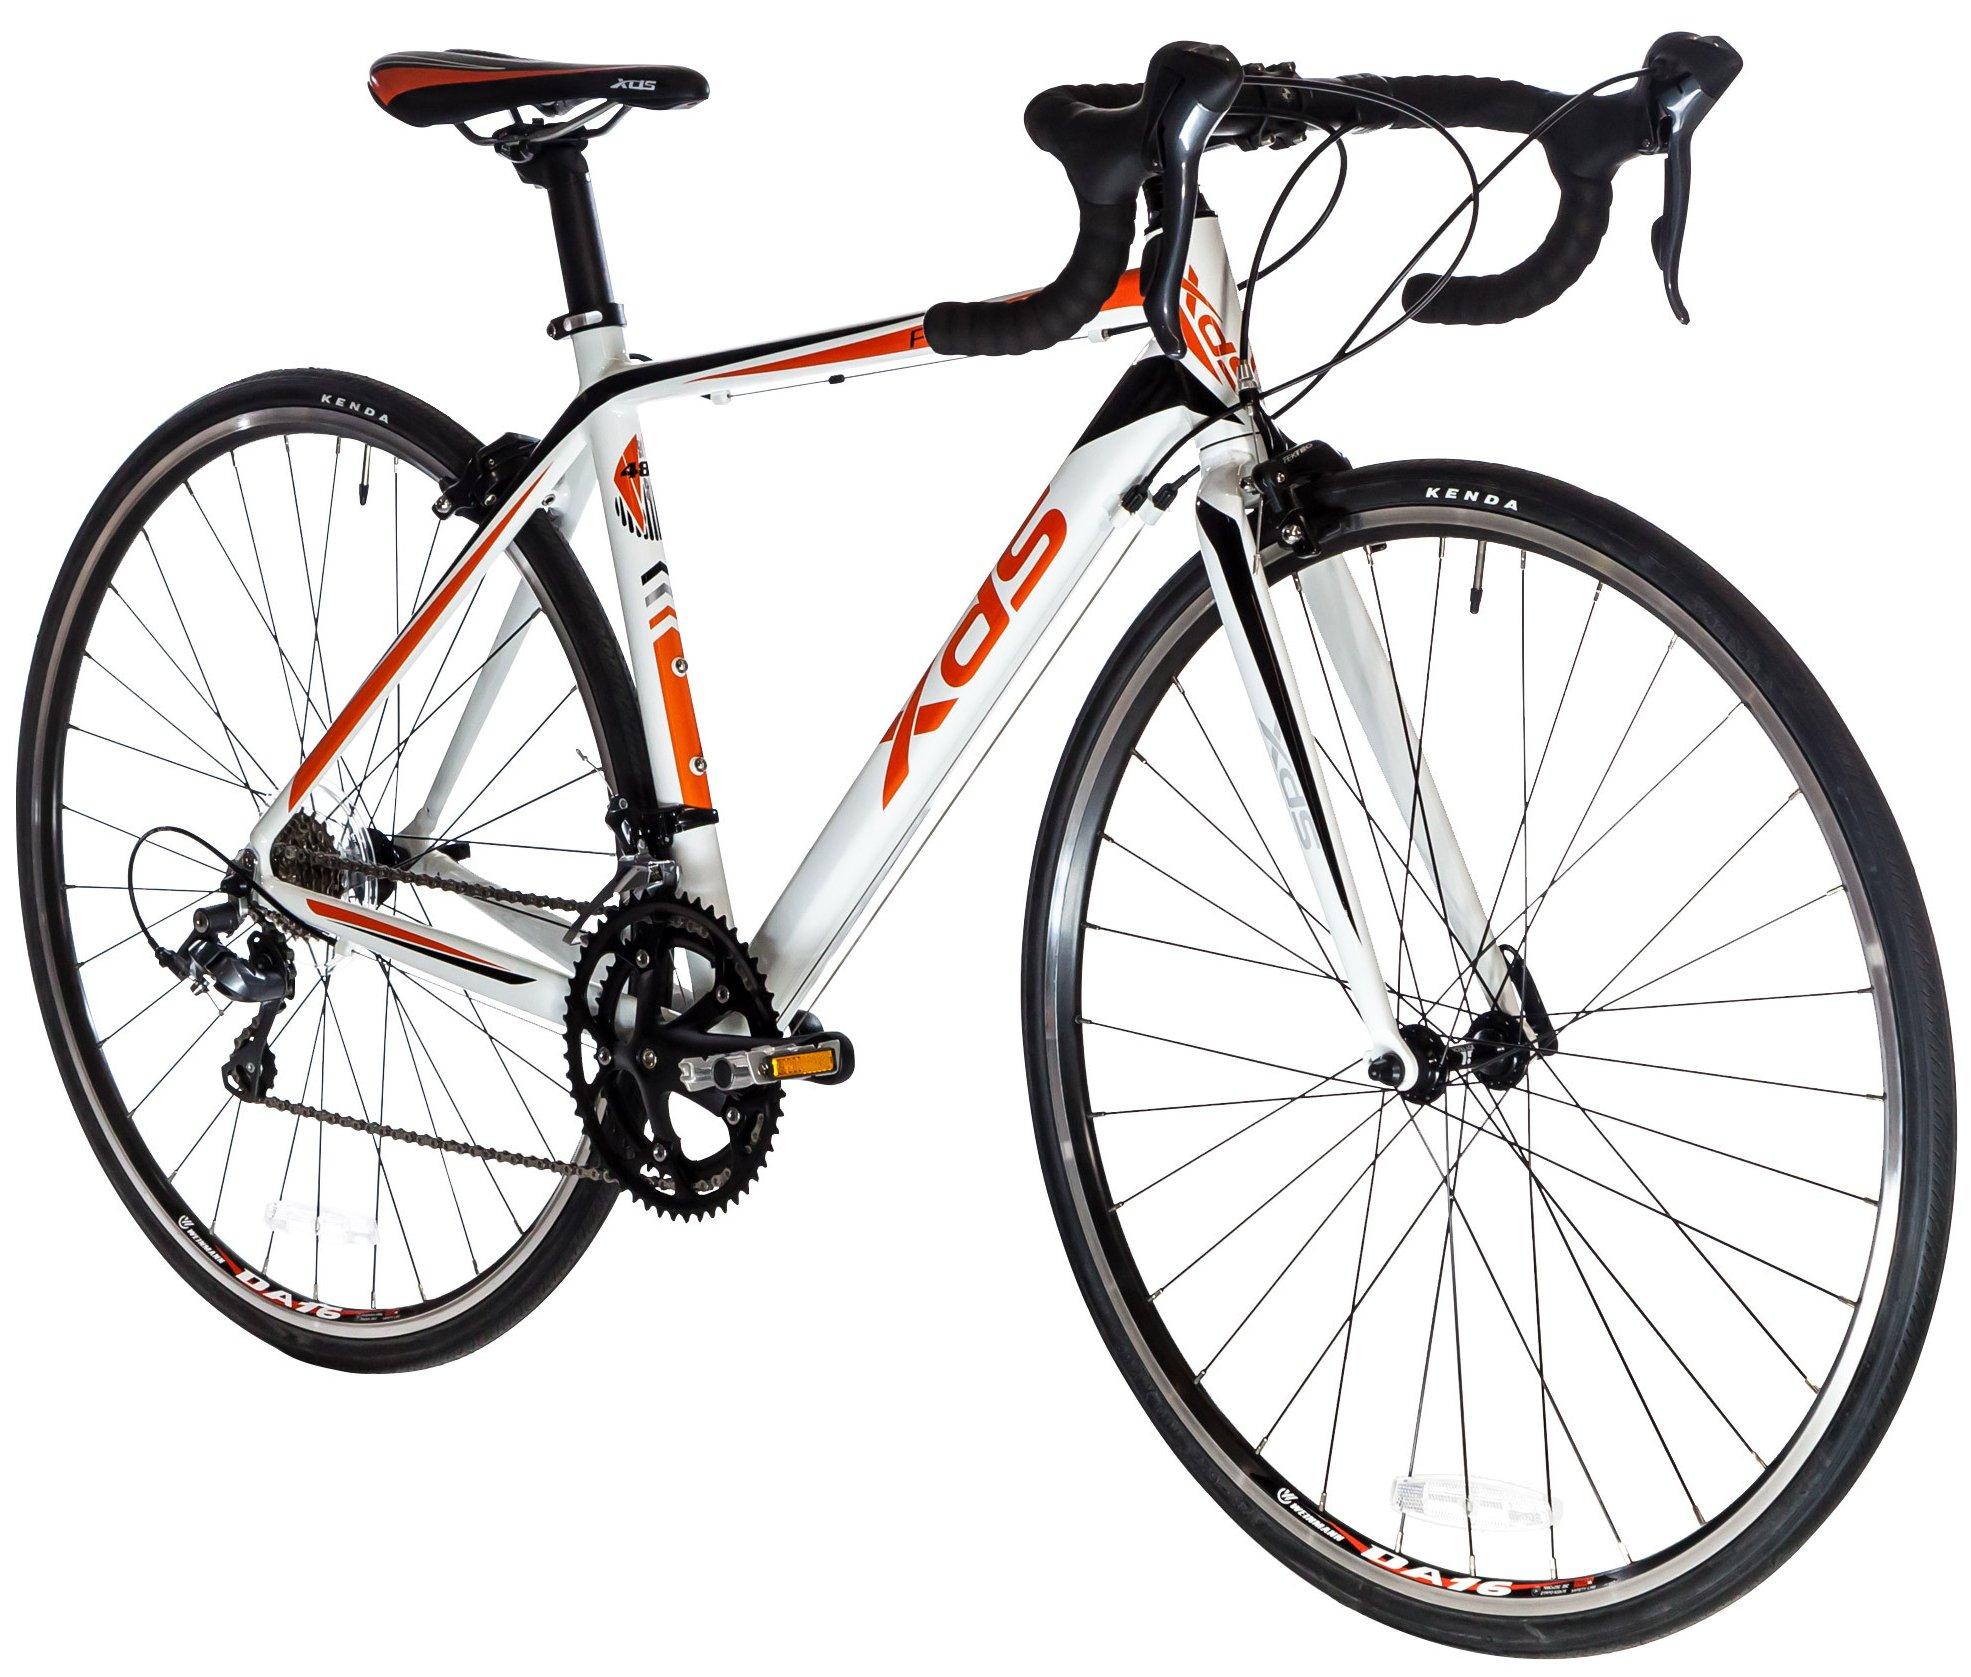 XDS RX310 Mens 16 Speed Road Bike